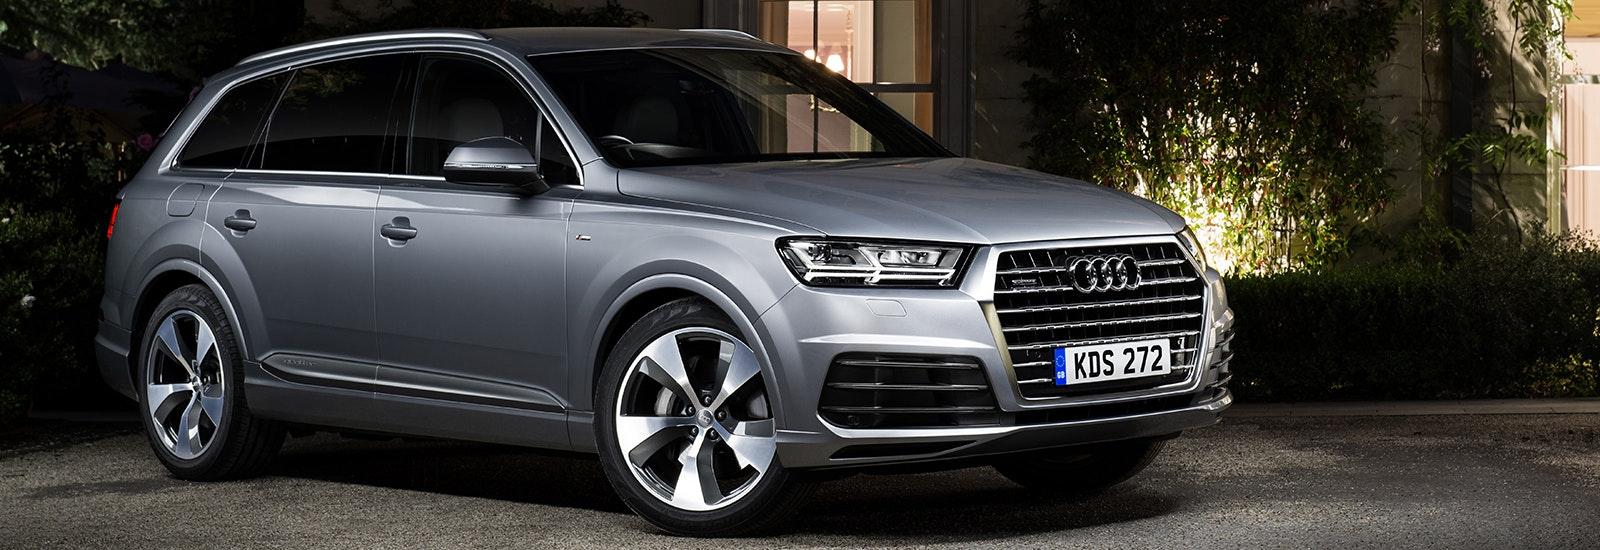 Gentil 1. Audi Q7